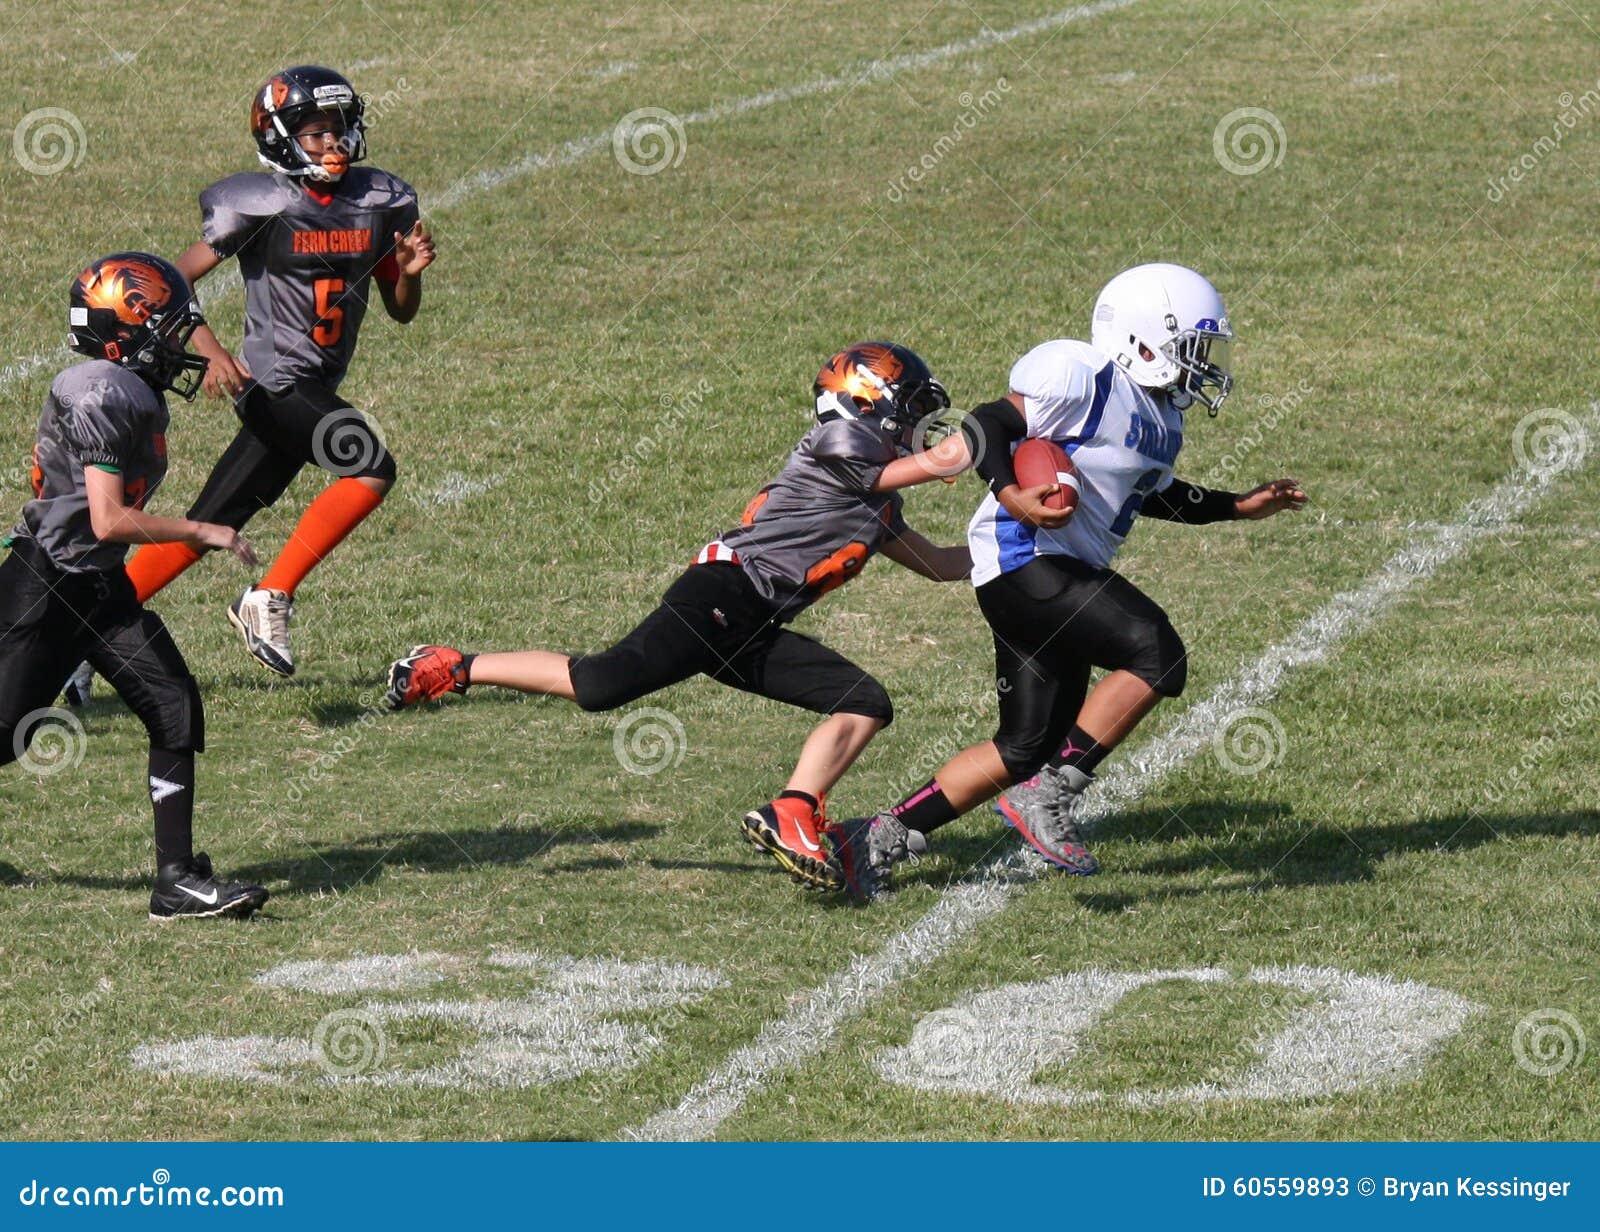 11u youth football runner on 30 yard line